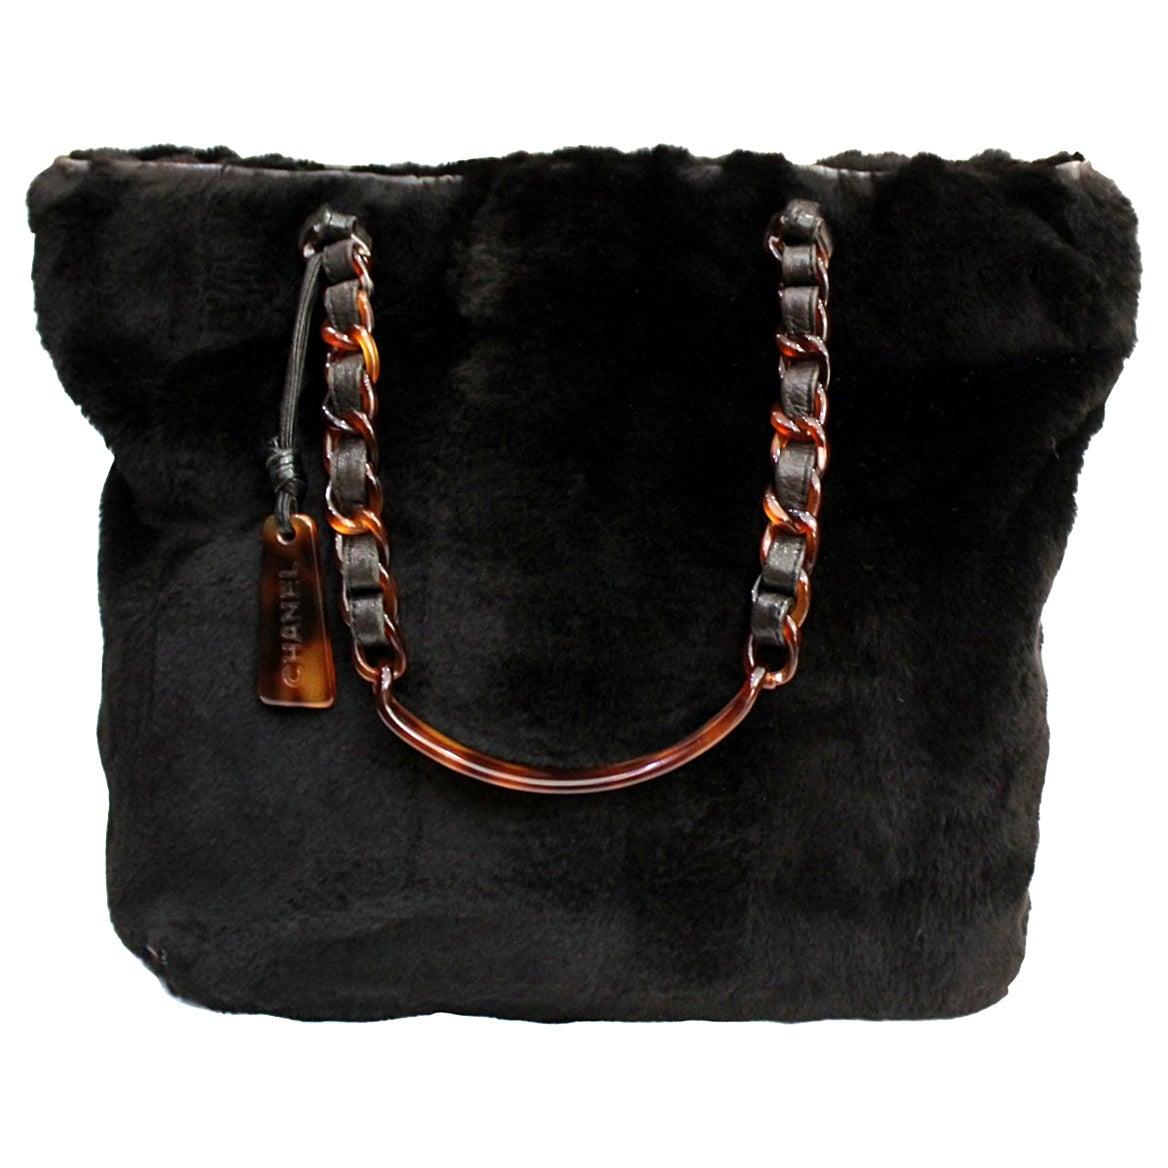 1997/1999 Chanel Shopper Bag